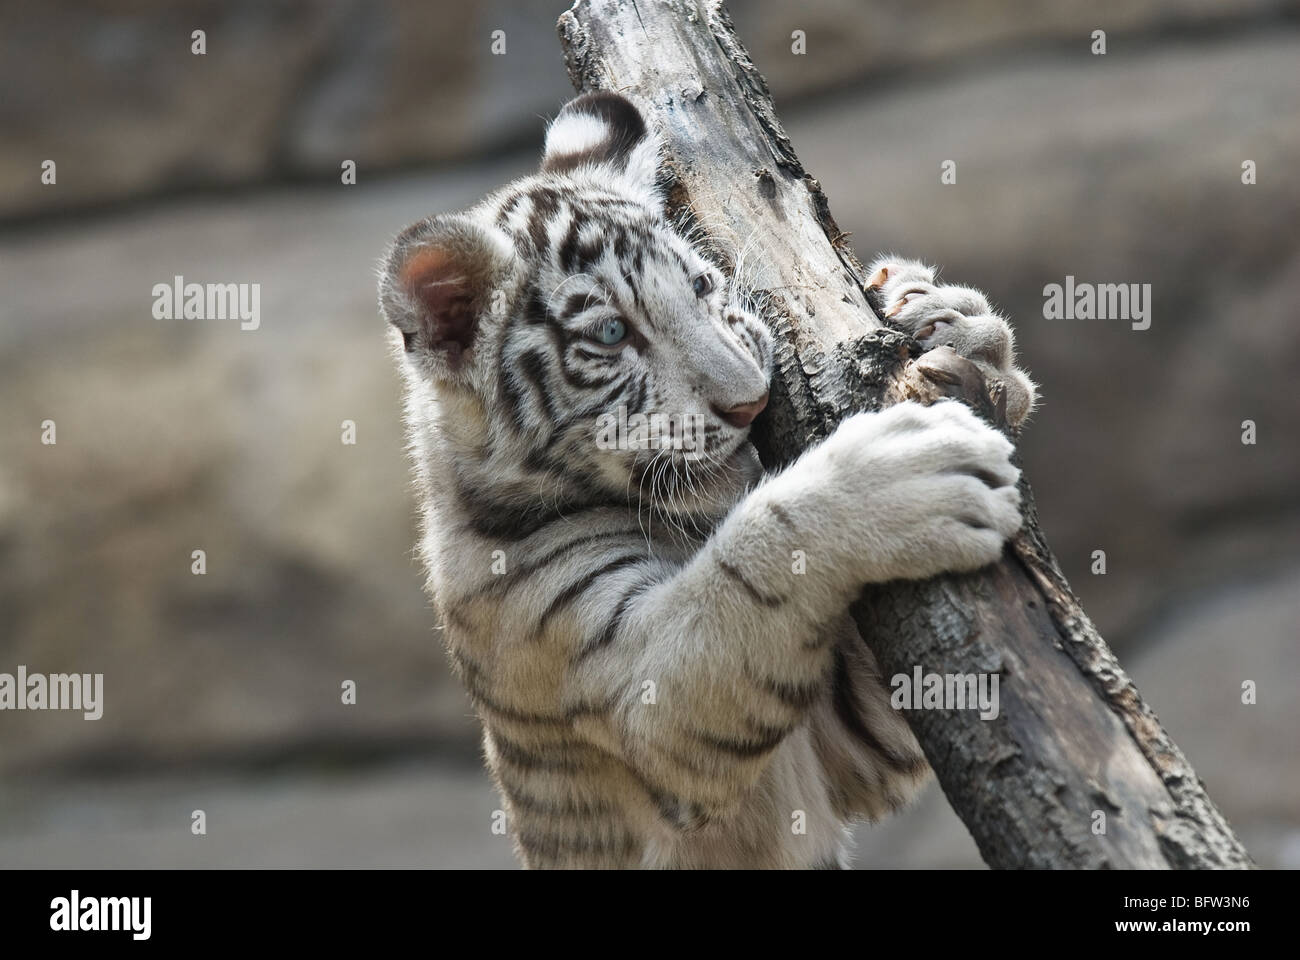 Tigre blanco Imagen De Stock